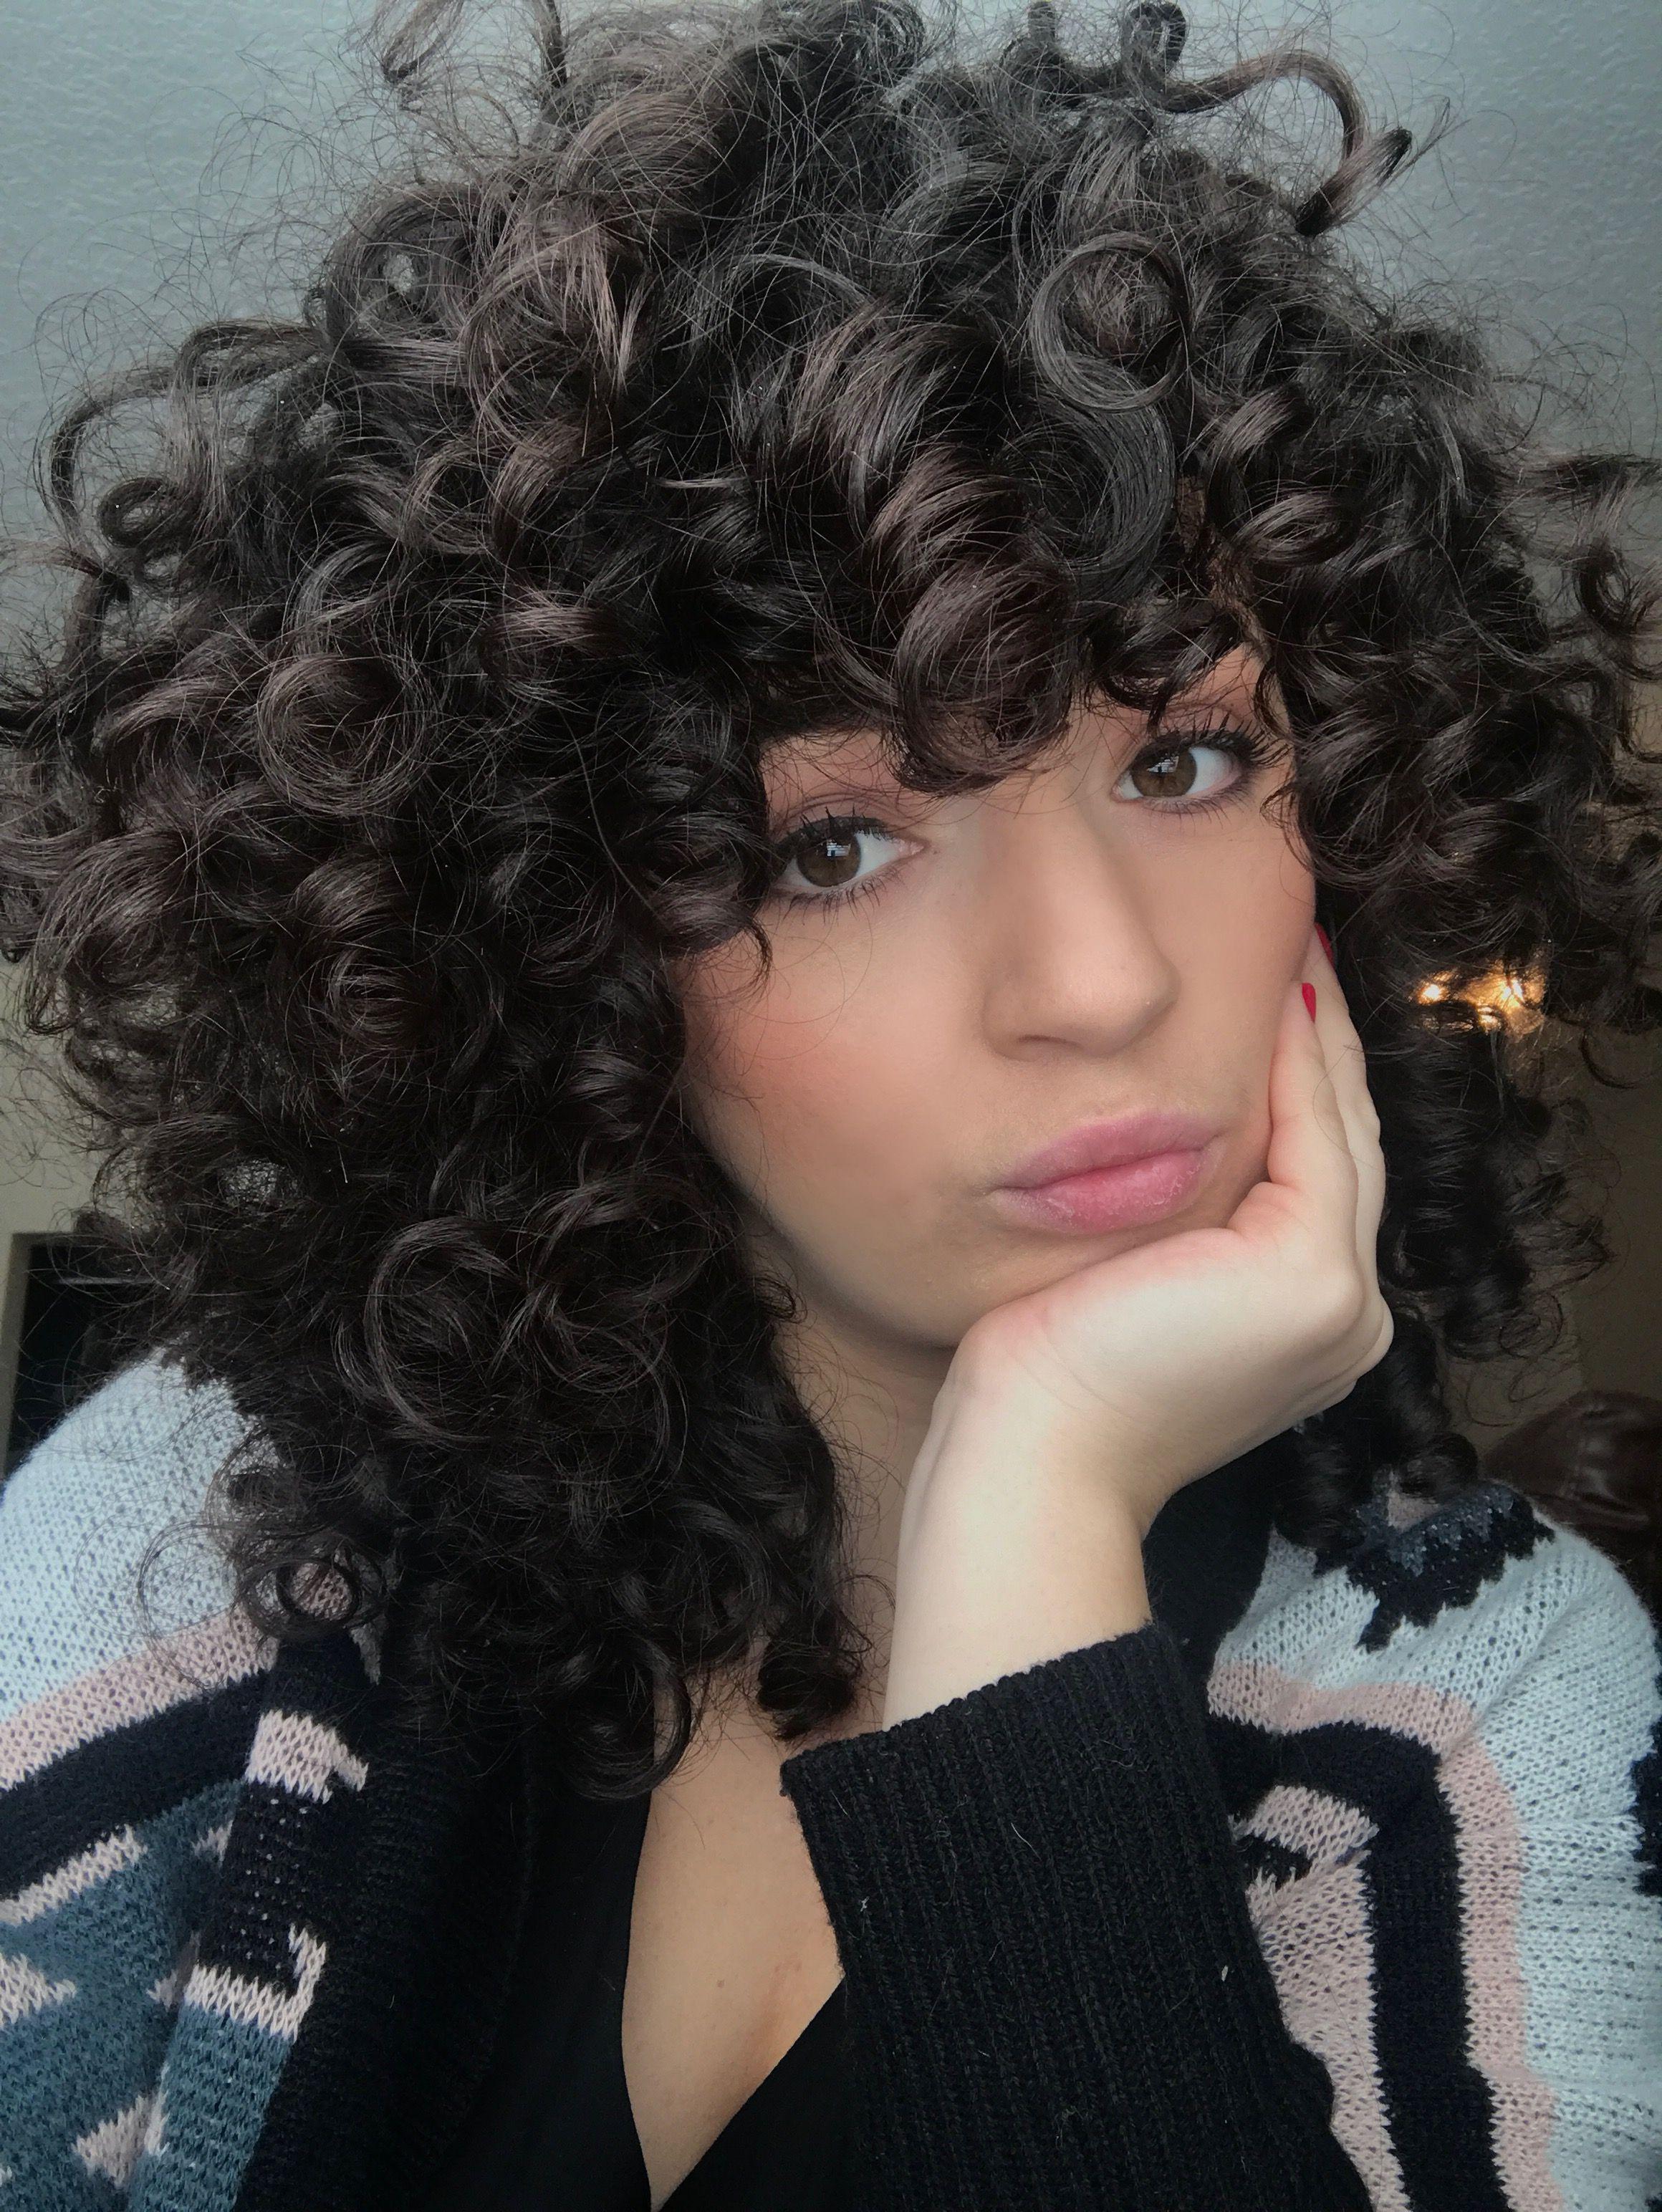 3b Curls Shaggy Cut Curly Hair Ig Littlemisssaly Shaggy Hair